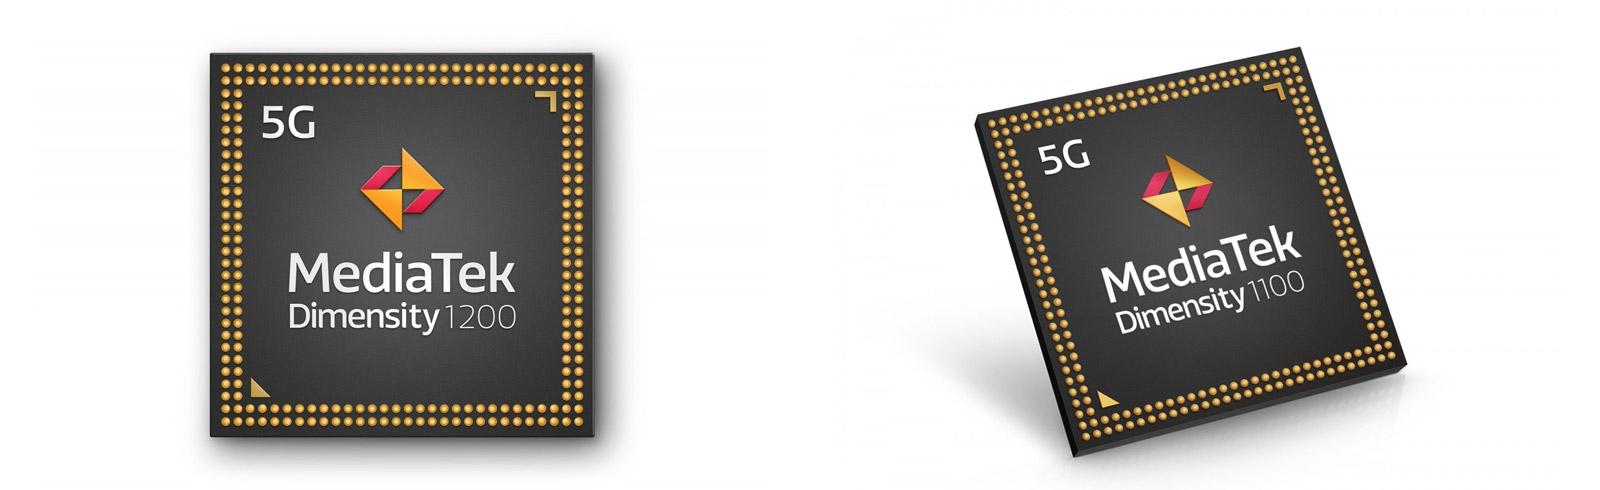 MediaTek presented the Dimensity 1200 and Dimensity 1100 6nm chipsets